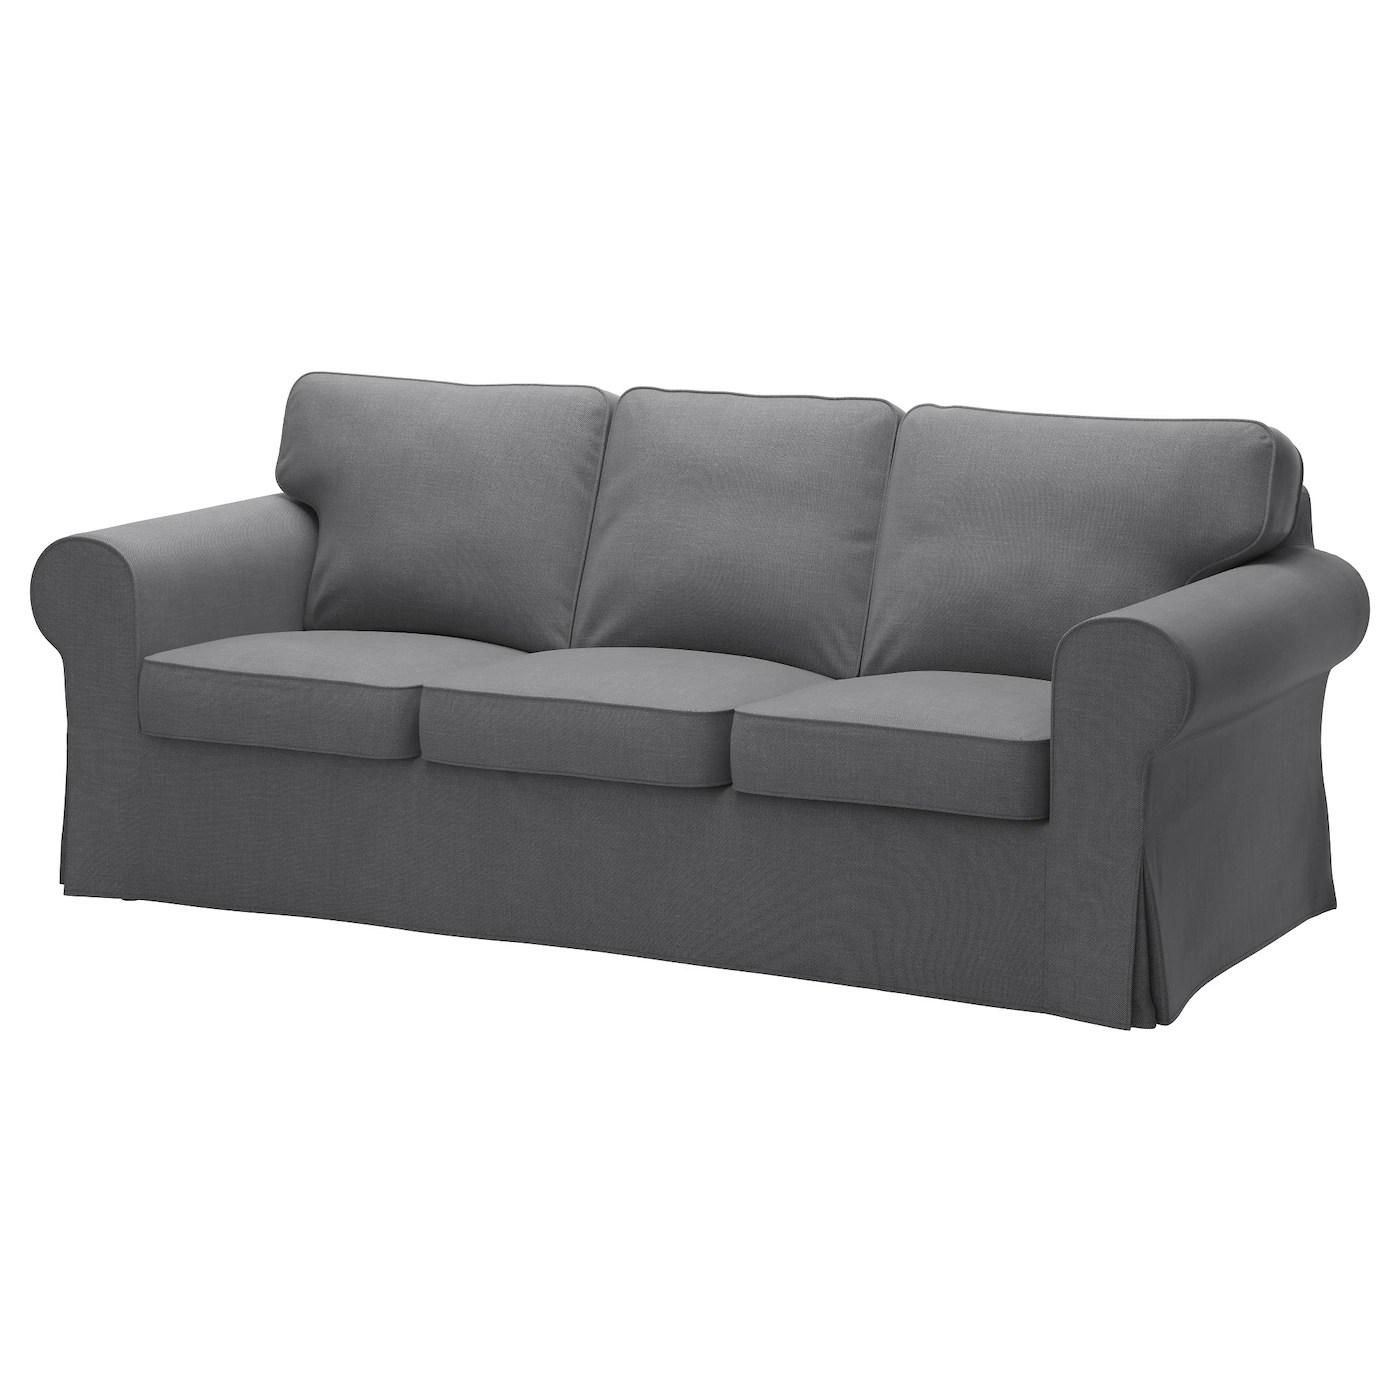 sofa foam cushions price india cama individual ektorp three-seat nordvalla dark grey - ikea